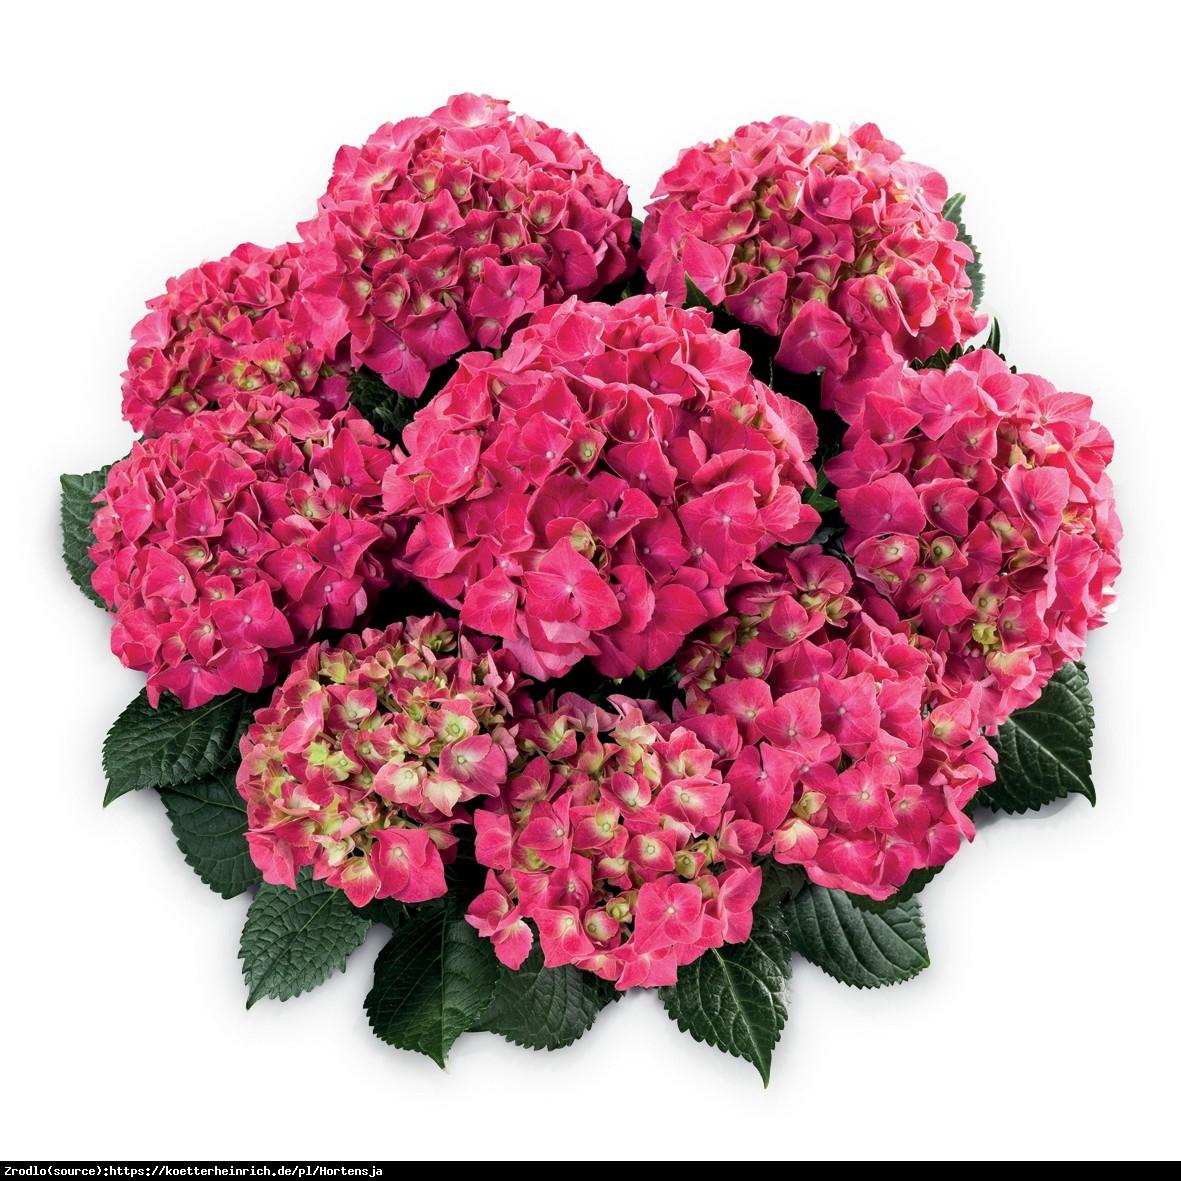 Hortensja Ogrodowa Speedy Red -  Hydrangea macrophylla Speedy Red